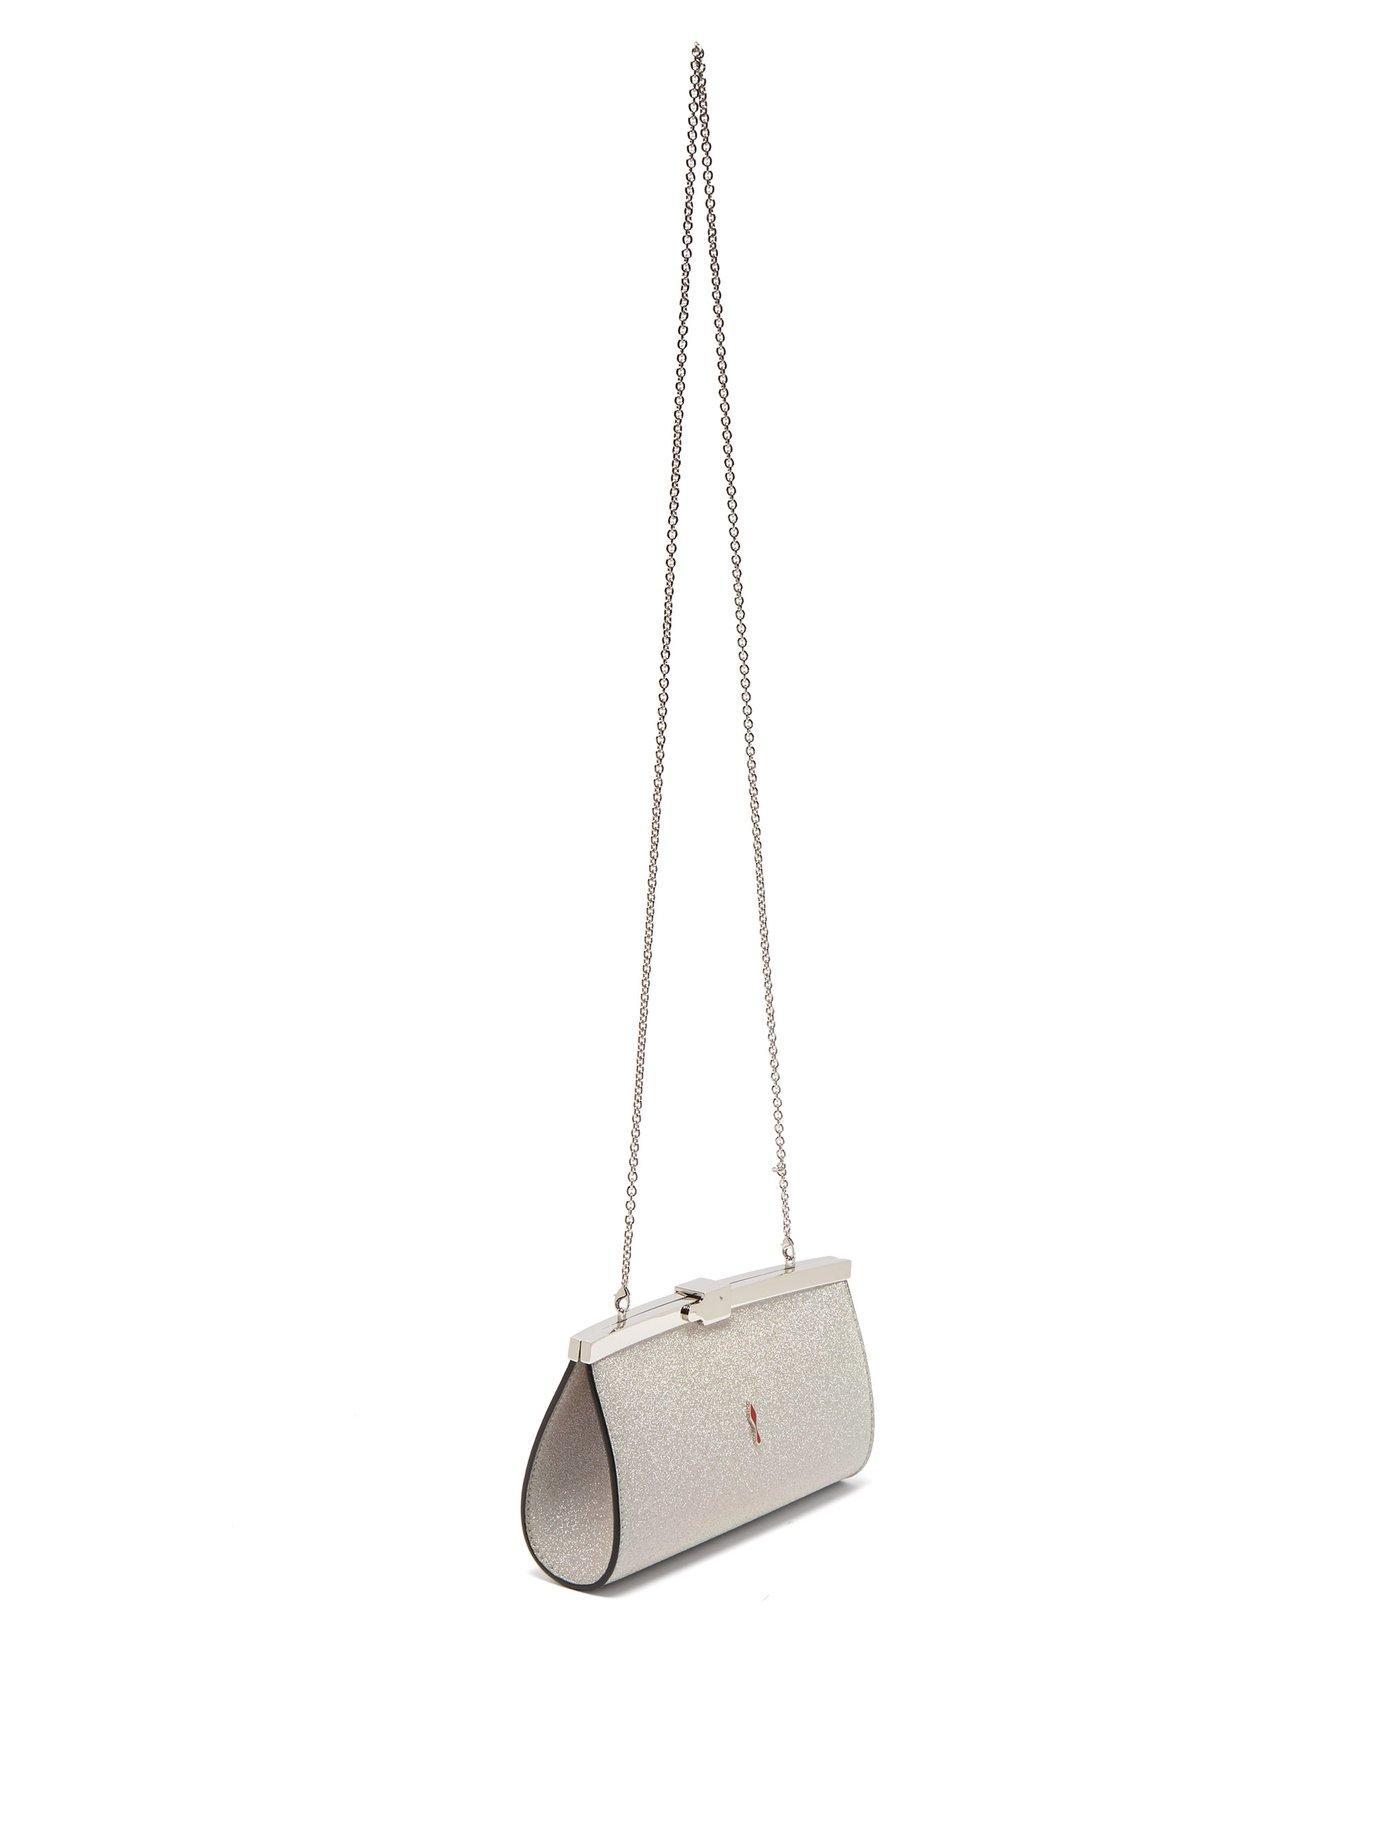 11607dd54 Christian Louboutin Palmette Glittered Leather Clutch Bag - Lyst